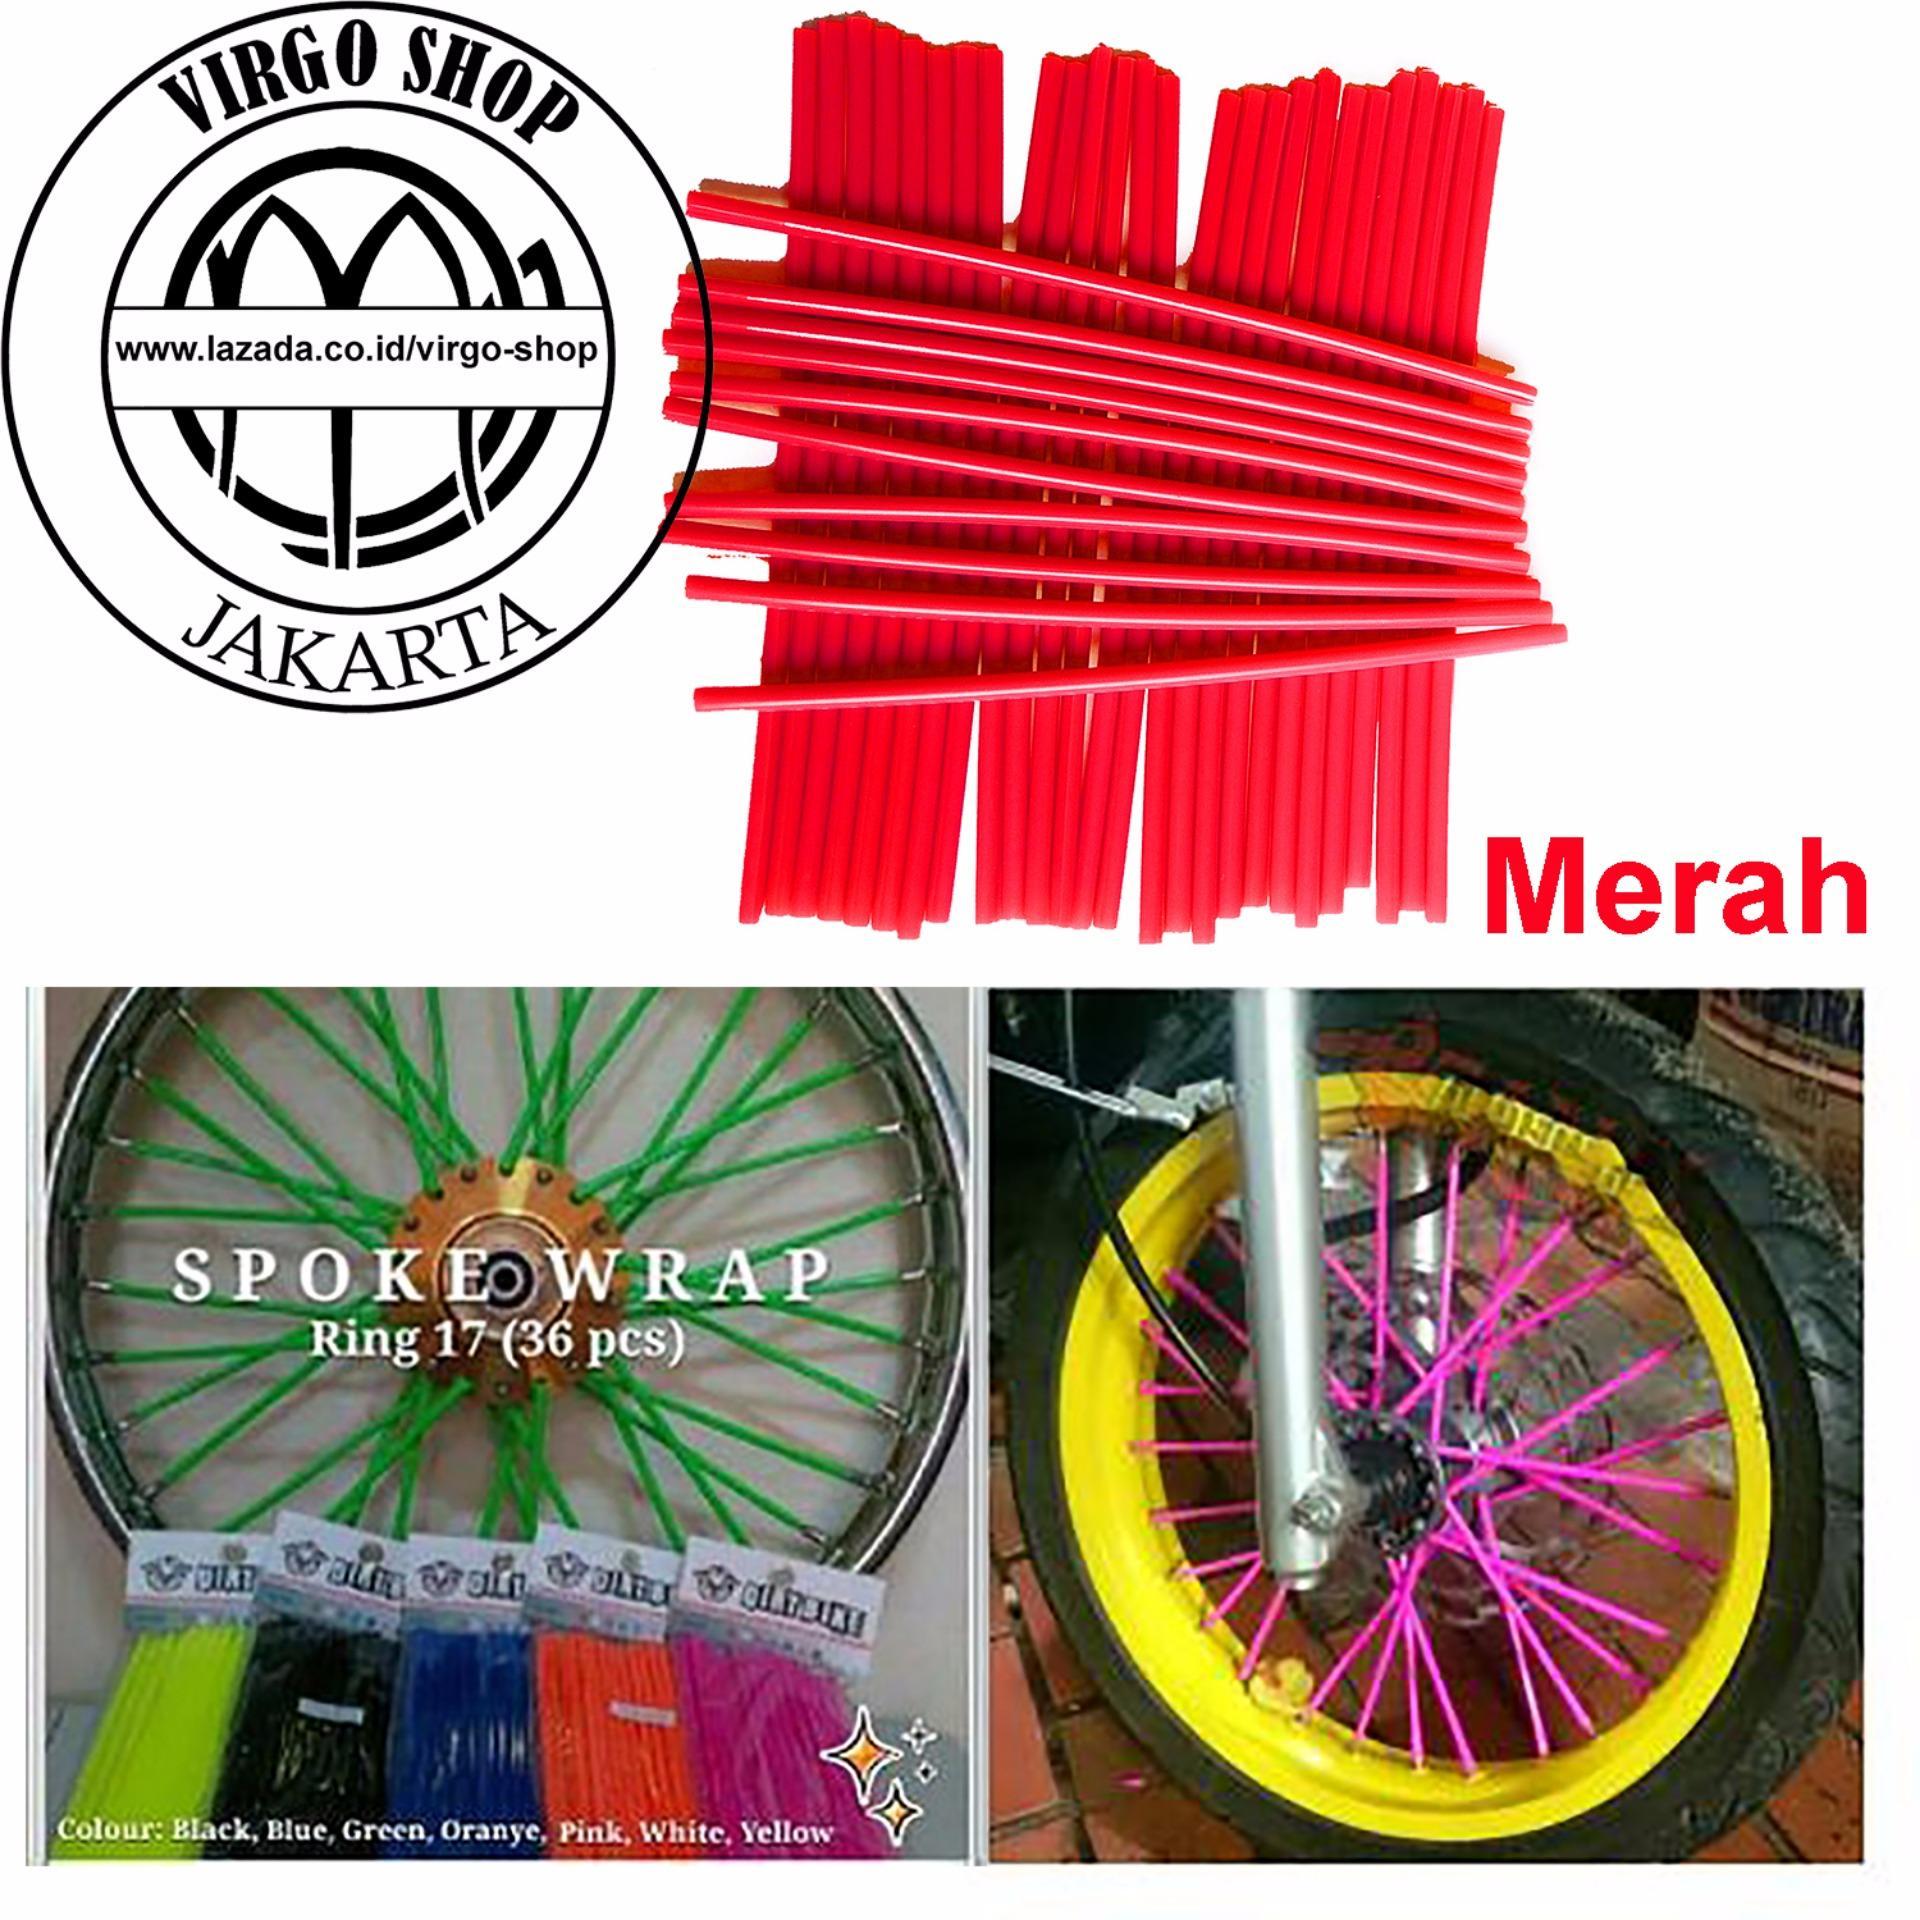 Buy Sell Cheapest Velg Vosen Vps1 Best Quality Product Deals Wheel Protector Hitam Pelindung List Universal Selongsong Jari Motor Sedotan Merah